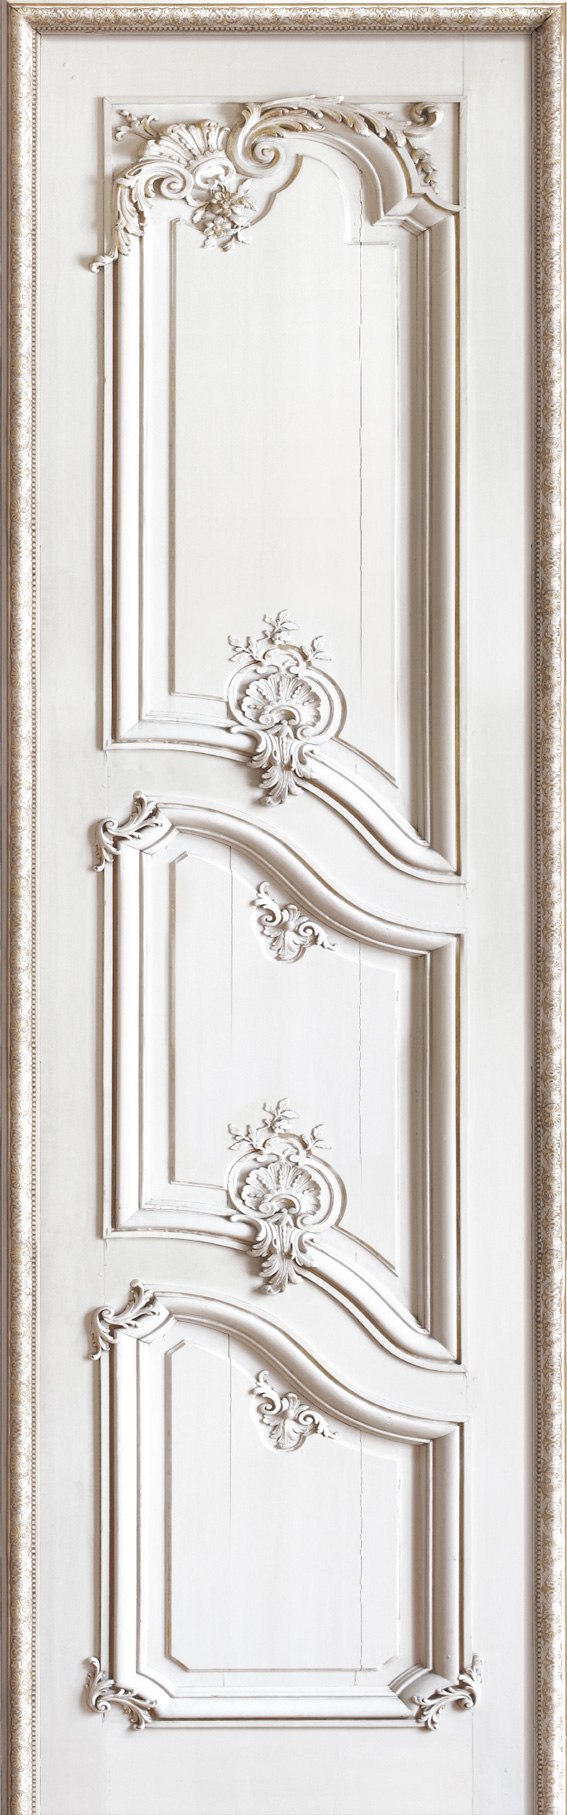 french trompe l'oeil wallpaperchristophe koziel - right